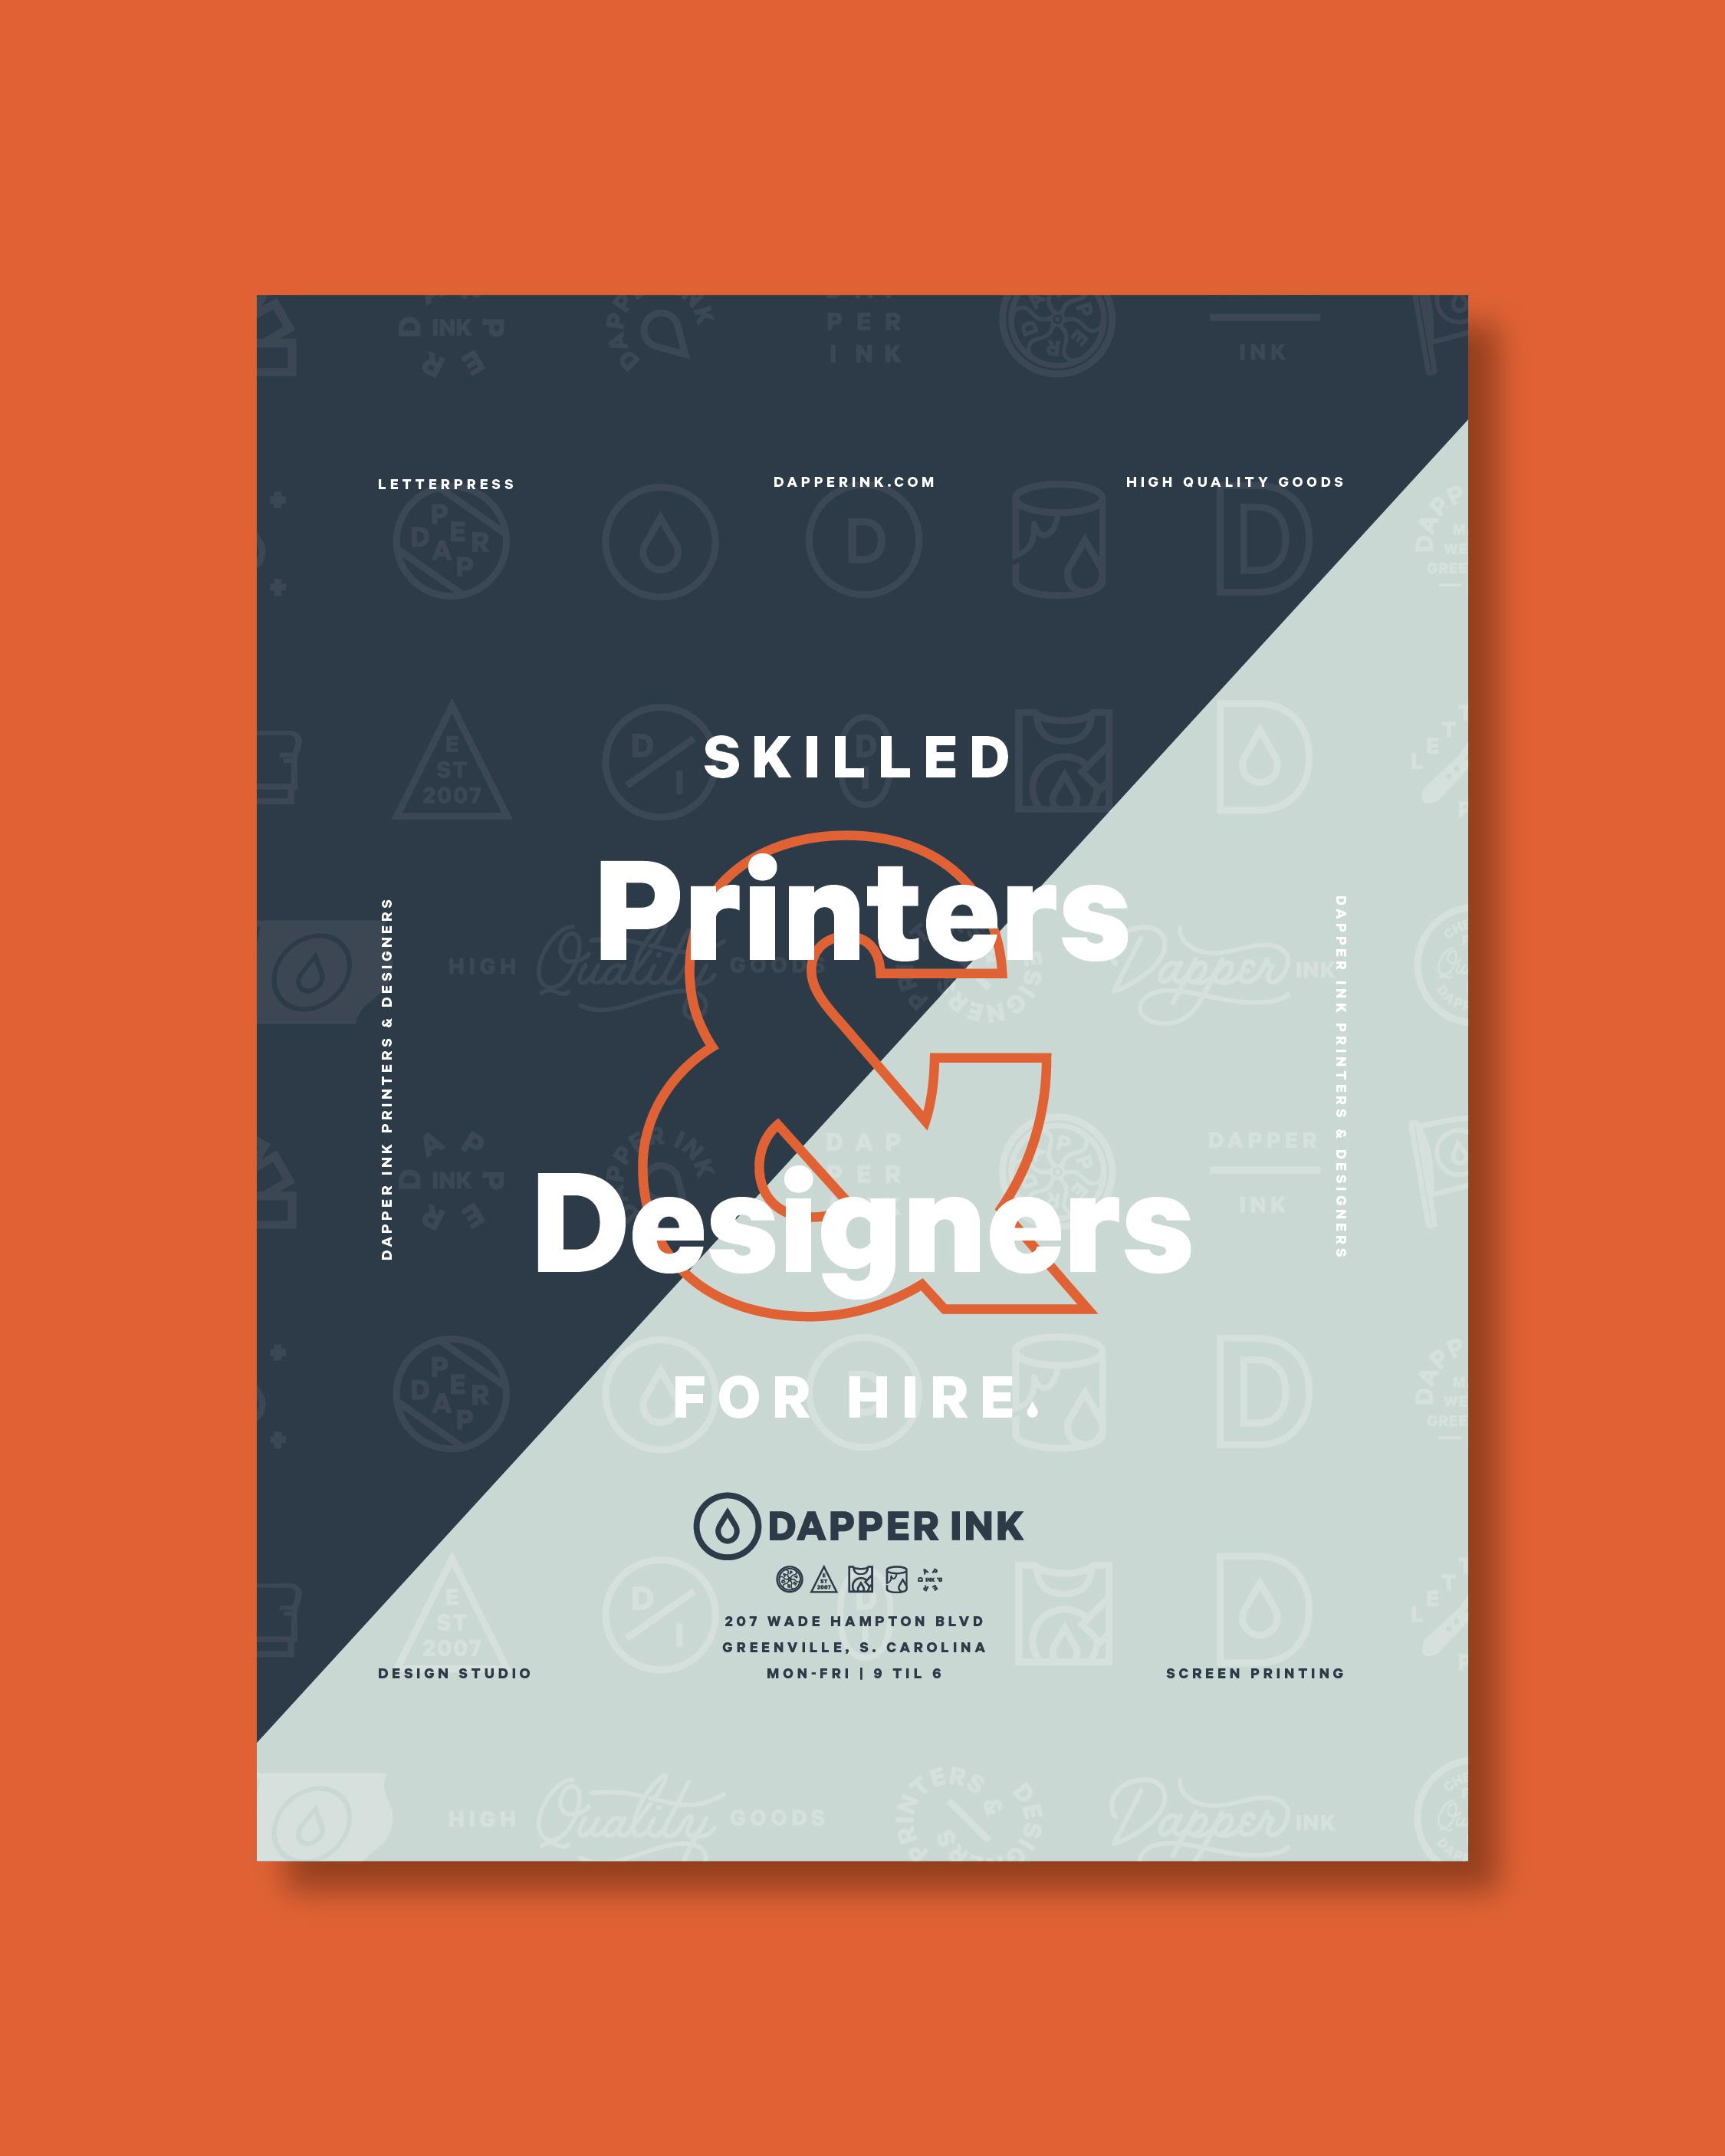 Jacob Boyles / Projects / Dapper Ink | Dribbble